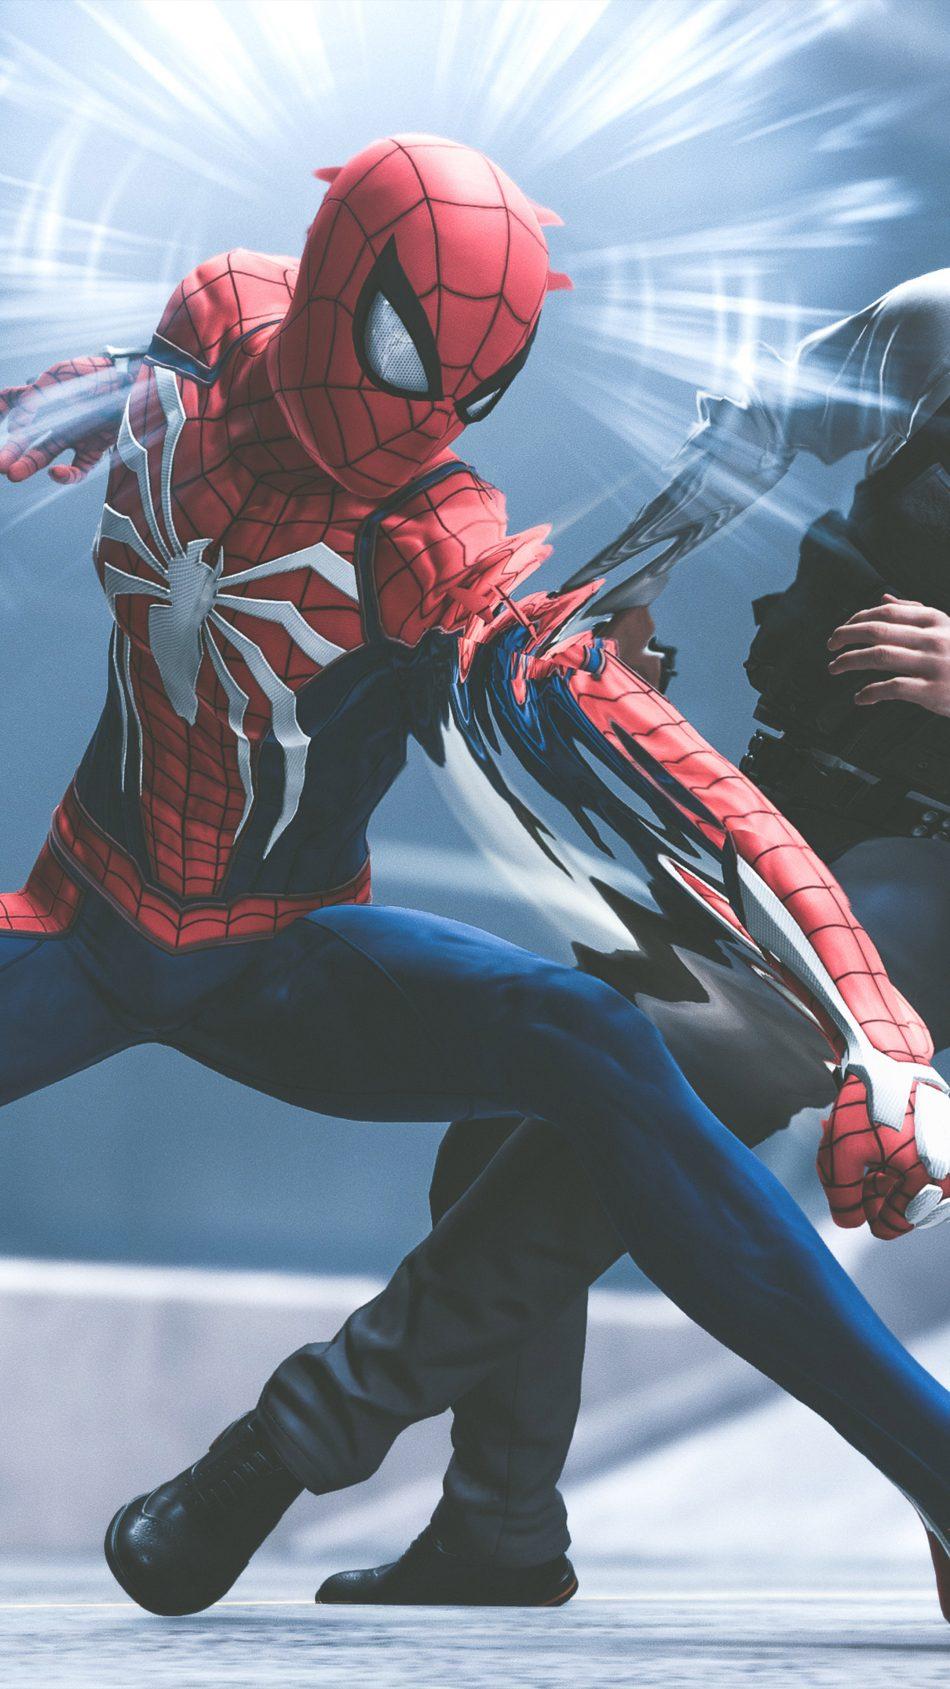 Spider Man Playstation 4 Video Game 4k Ultra Hd Mobile Spiderman Phone Wallpaper 4k 950x1689 Wallpaper Teahub Io